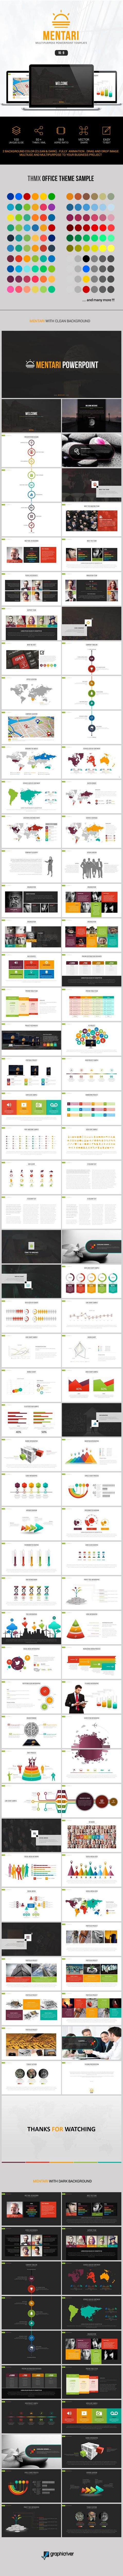 Mentari Powerpoint Template - Business PowerPoint Templates